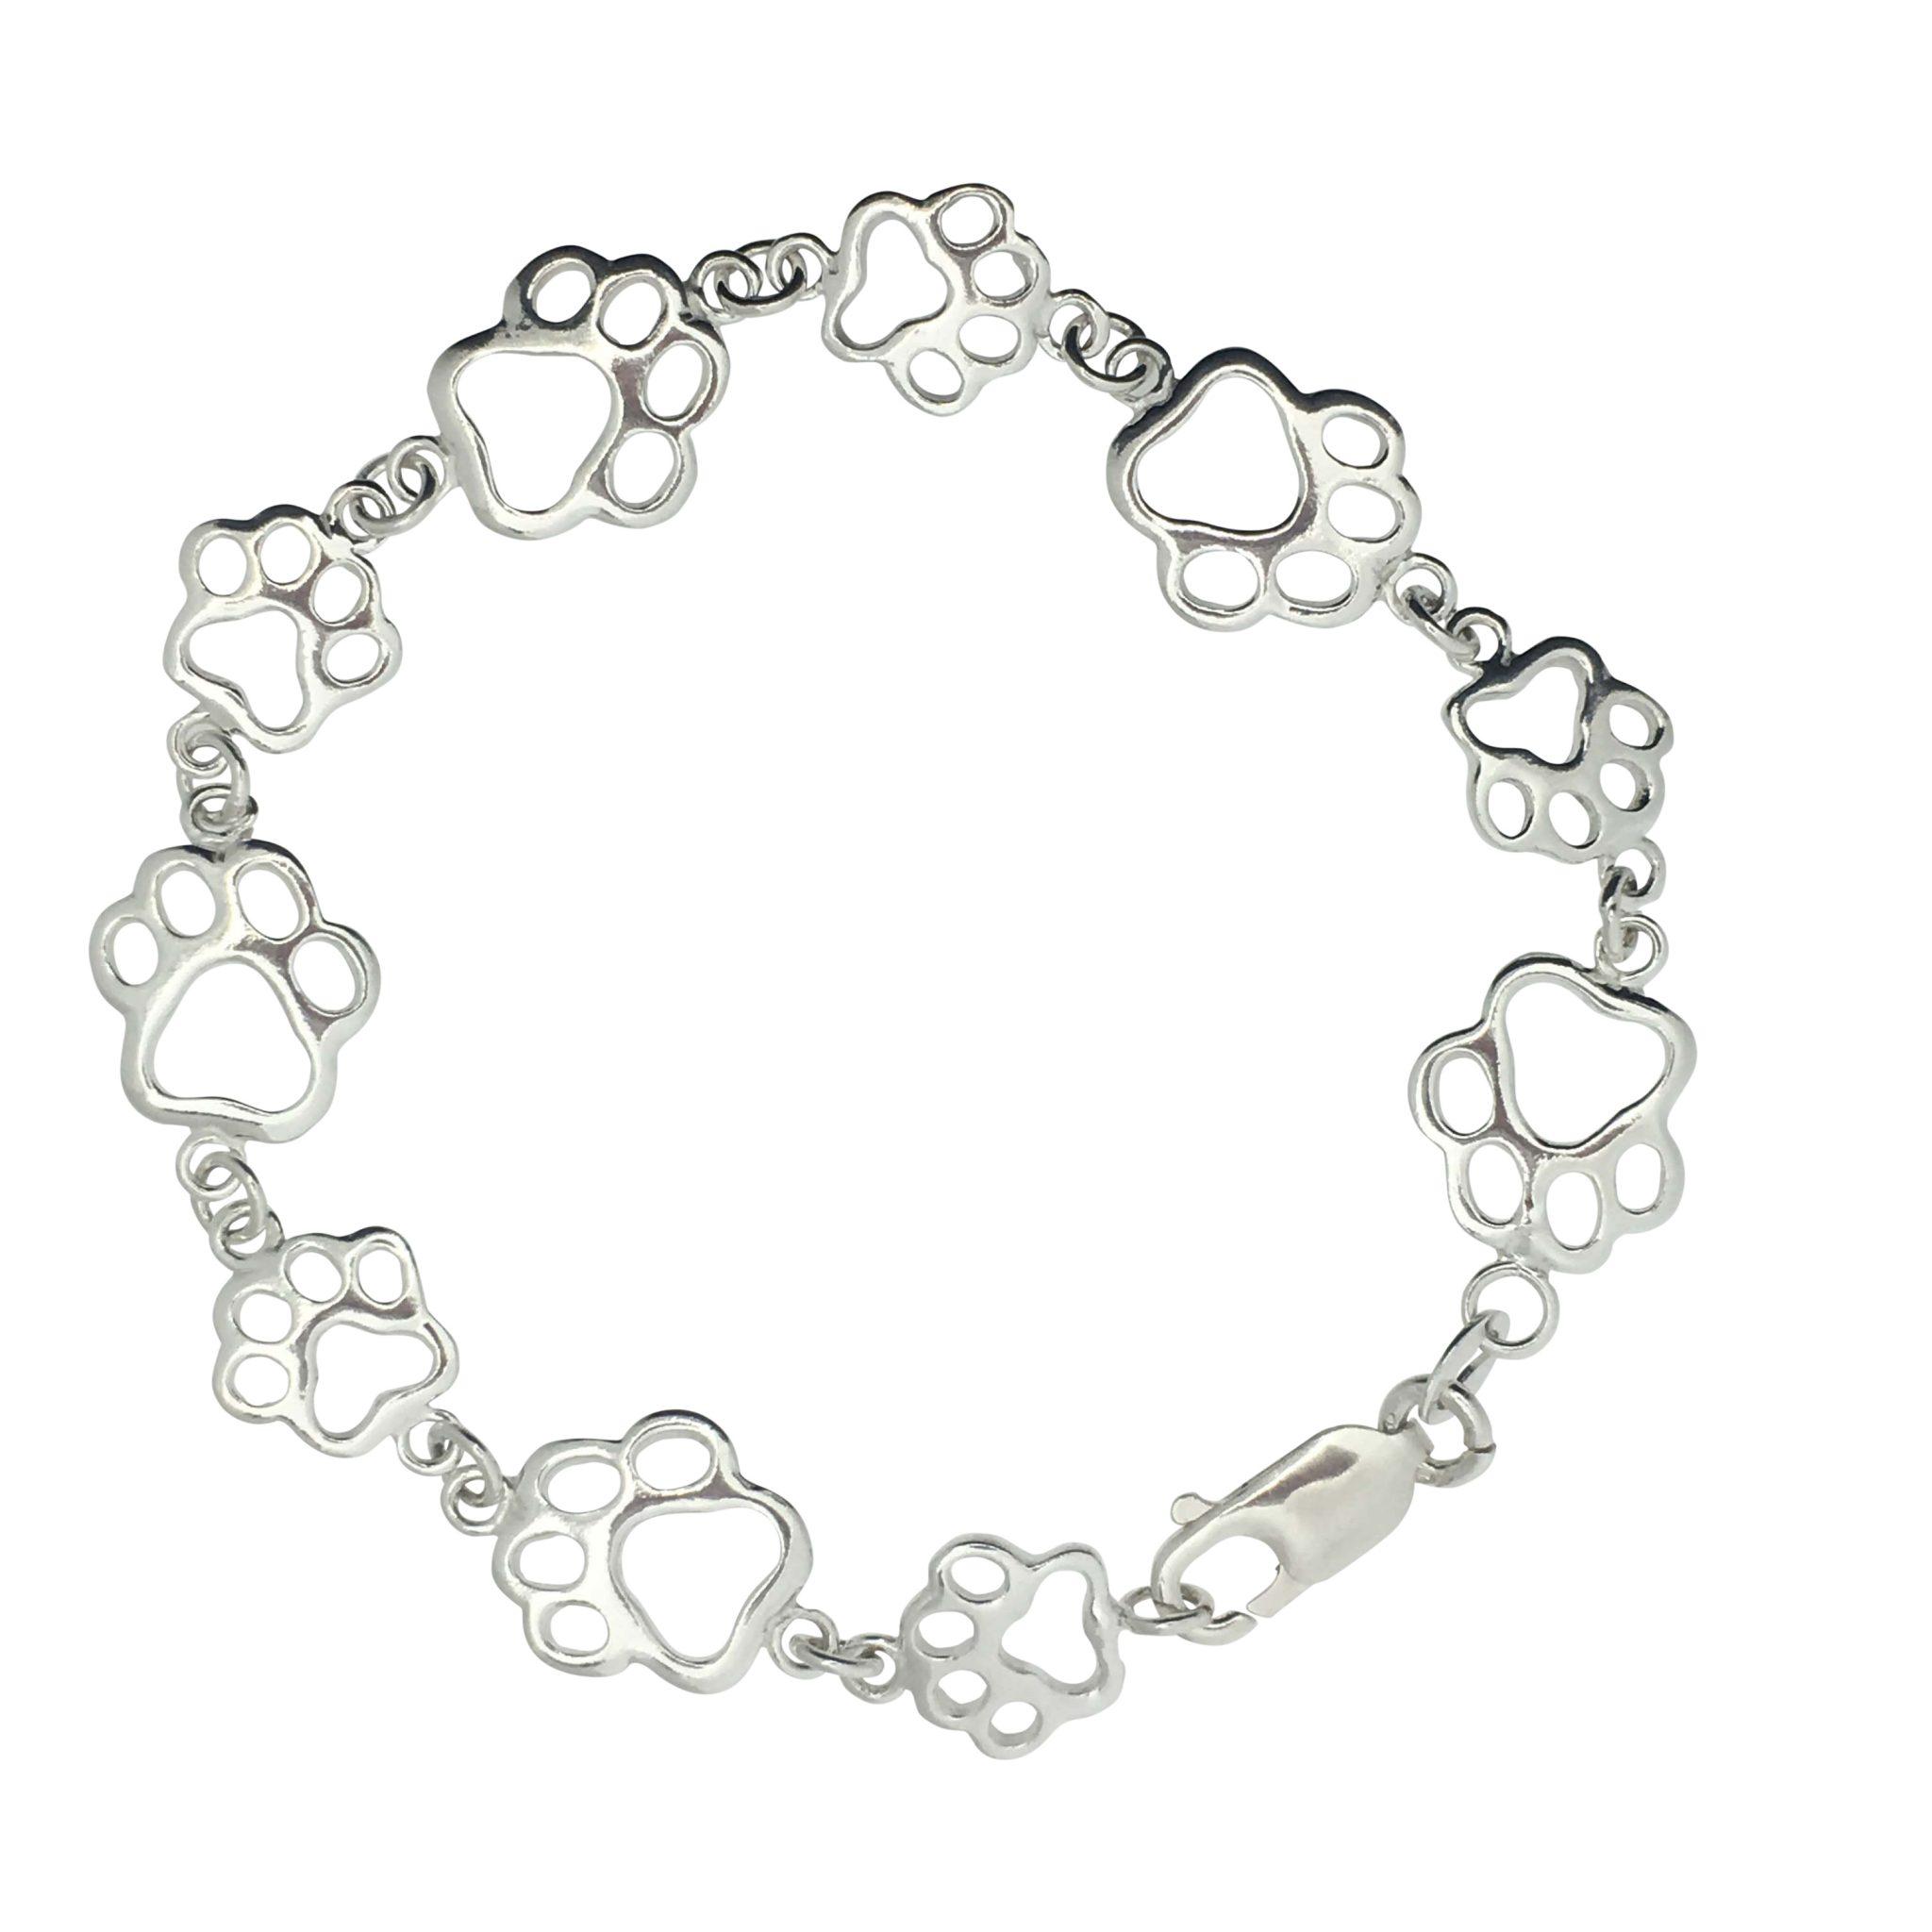 Pawprint Bracelet - The Silver Shop of Bath